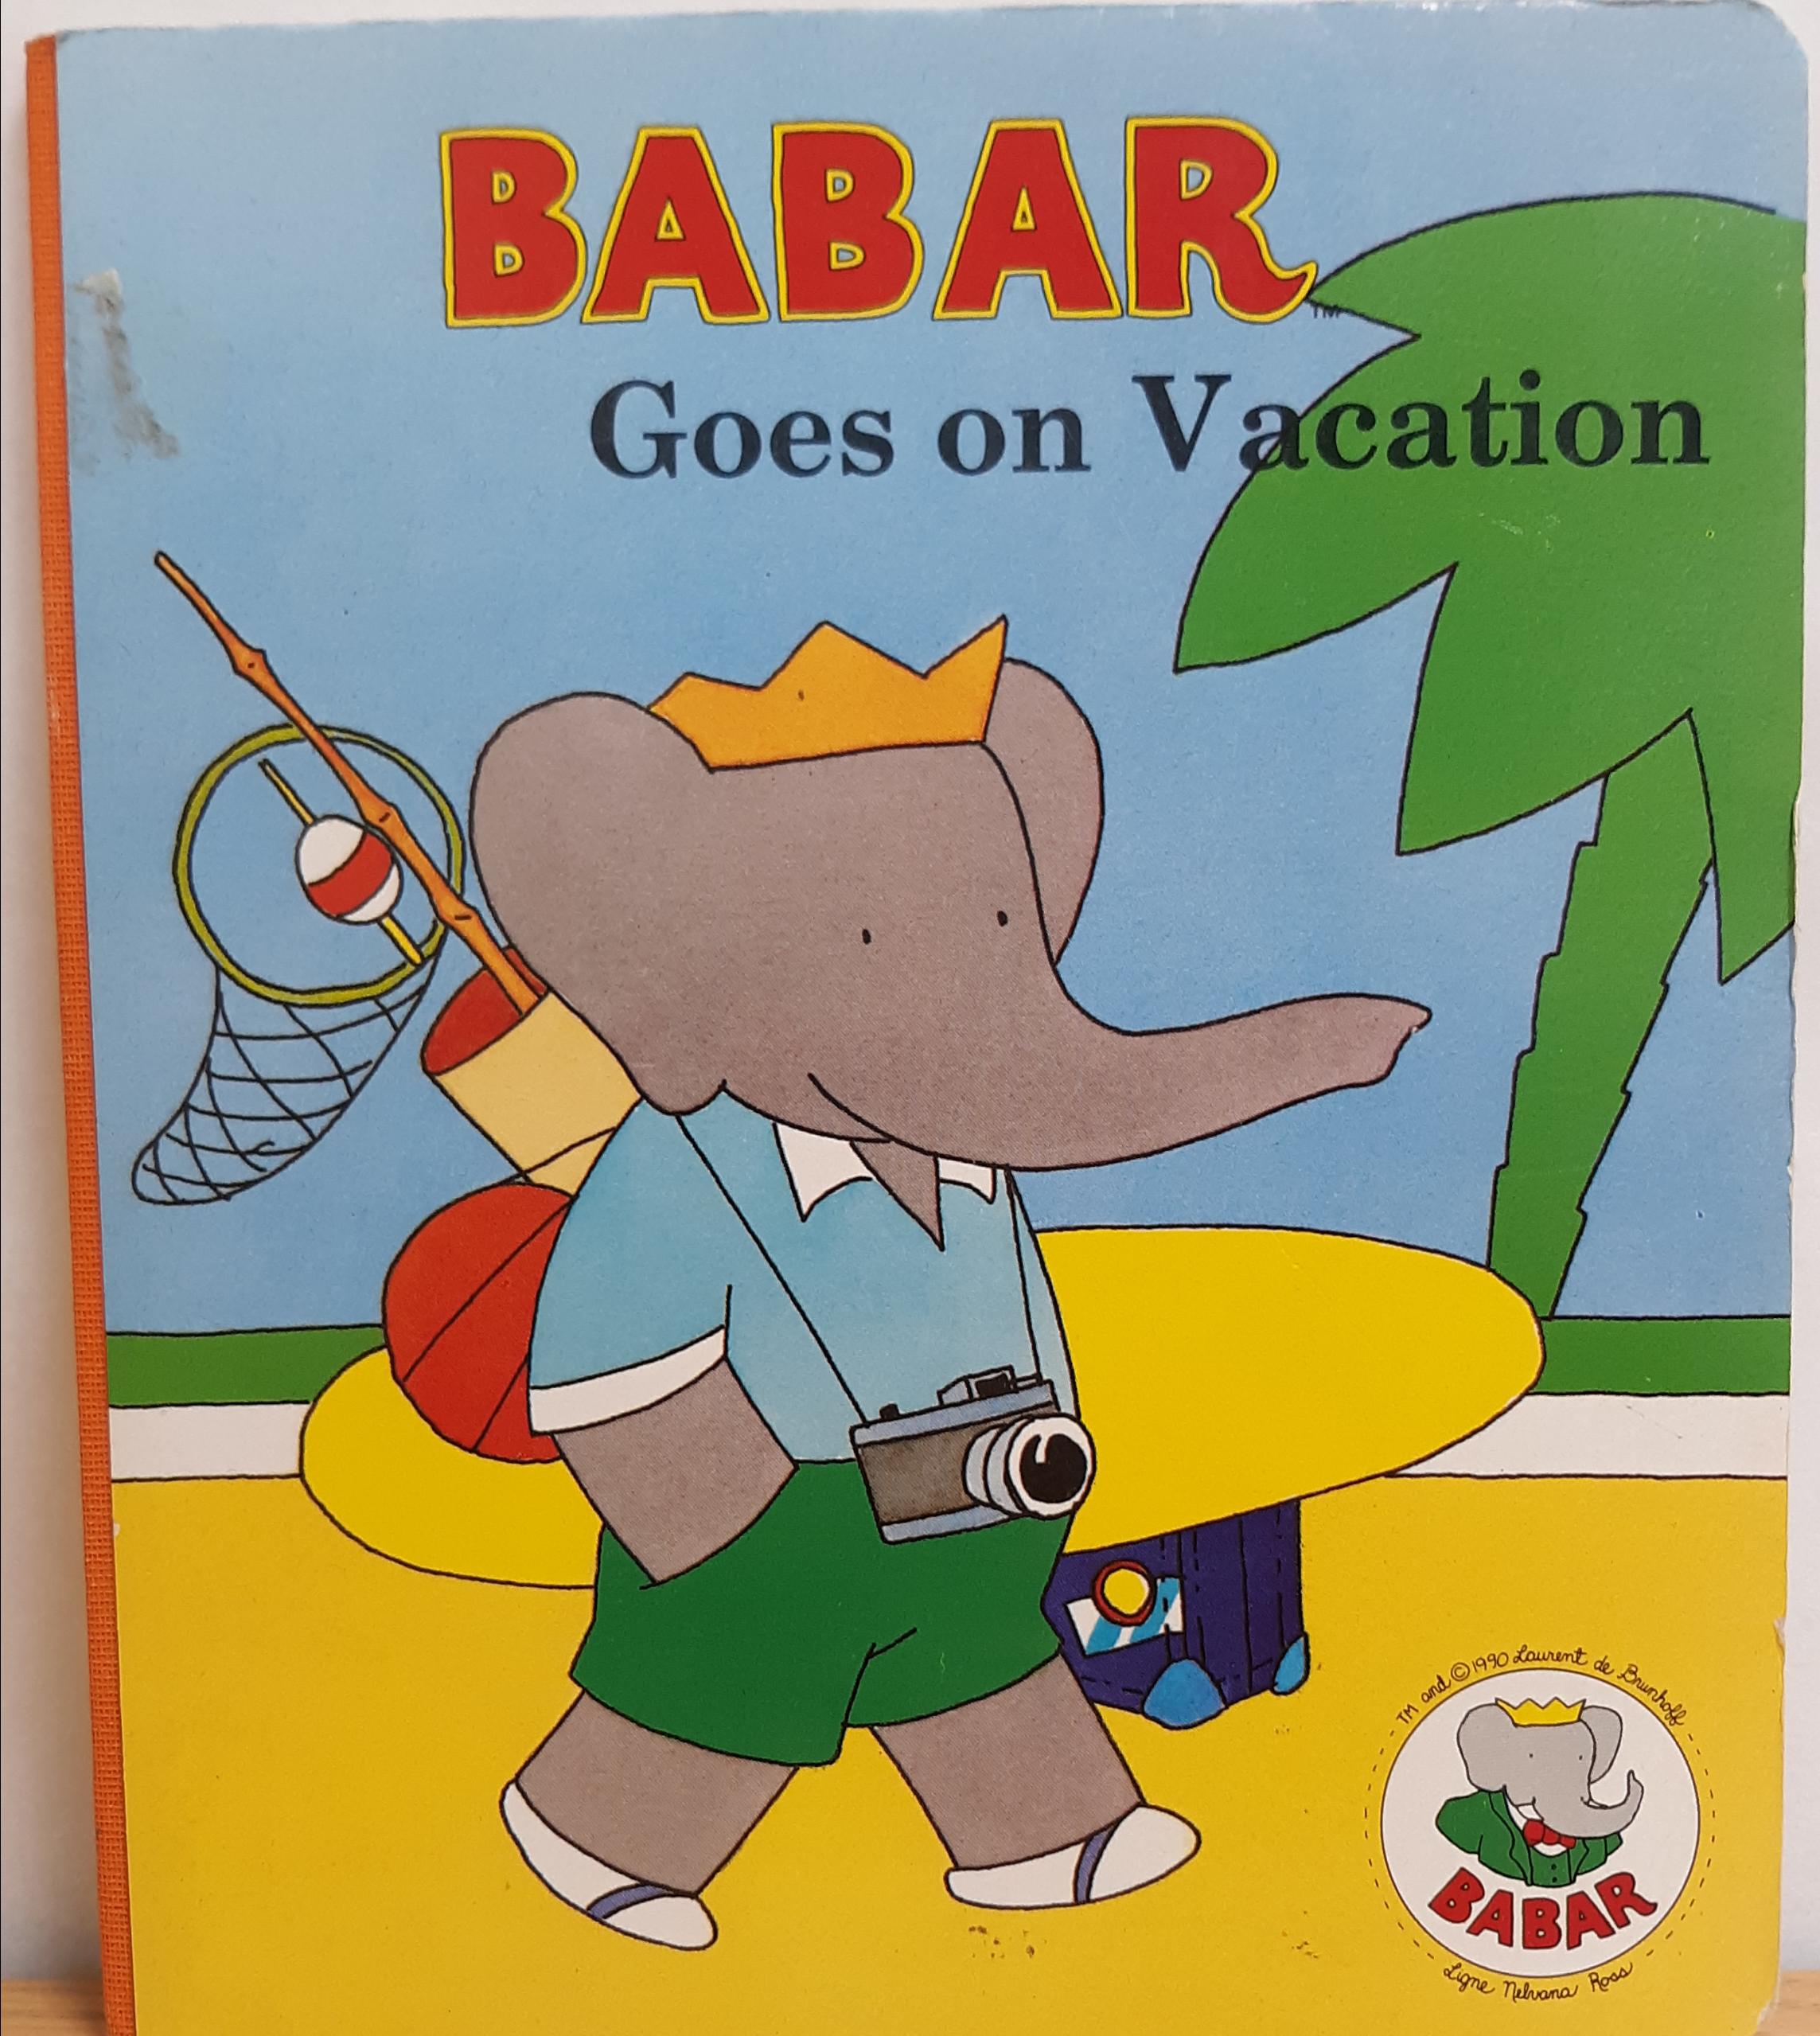 https://0201.nccdn.net/4_2/000/000/084/e5c/babar-goes-on-vacation.png